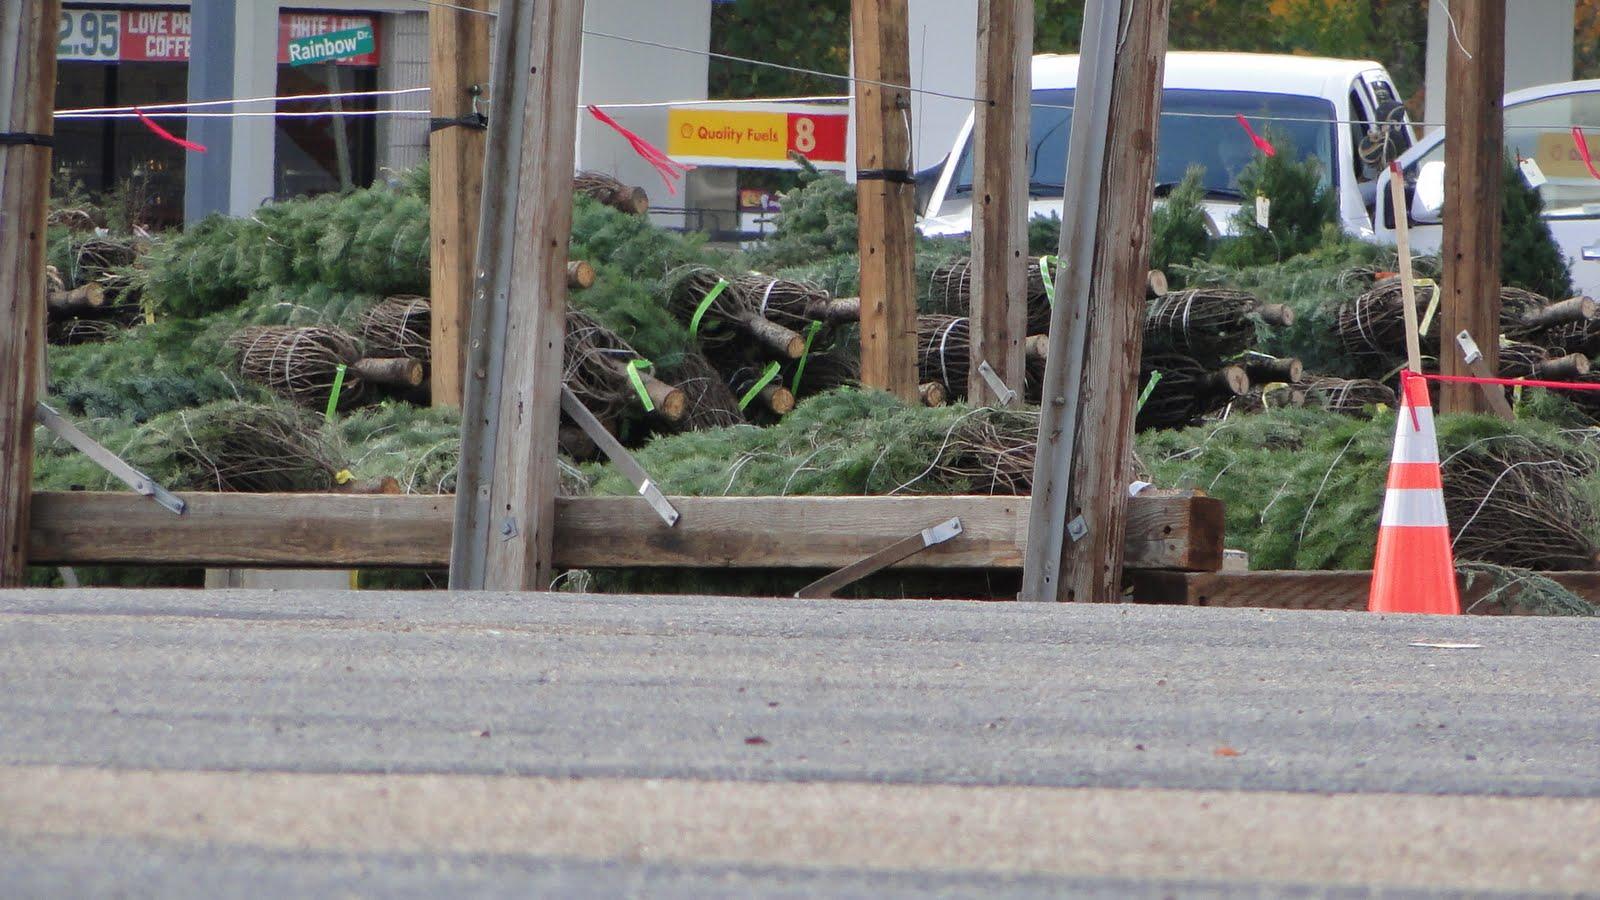 http://4.bp.blogspot.com/_xEw_wnCvE_0/TPAczq-r51I/AAAAAAAAJlg/O_-pc89Lq_Q/s1600/commercial_christmas_trees_24november2010.jpg